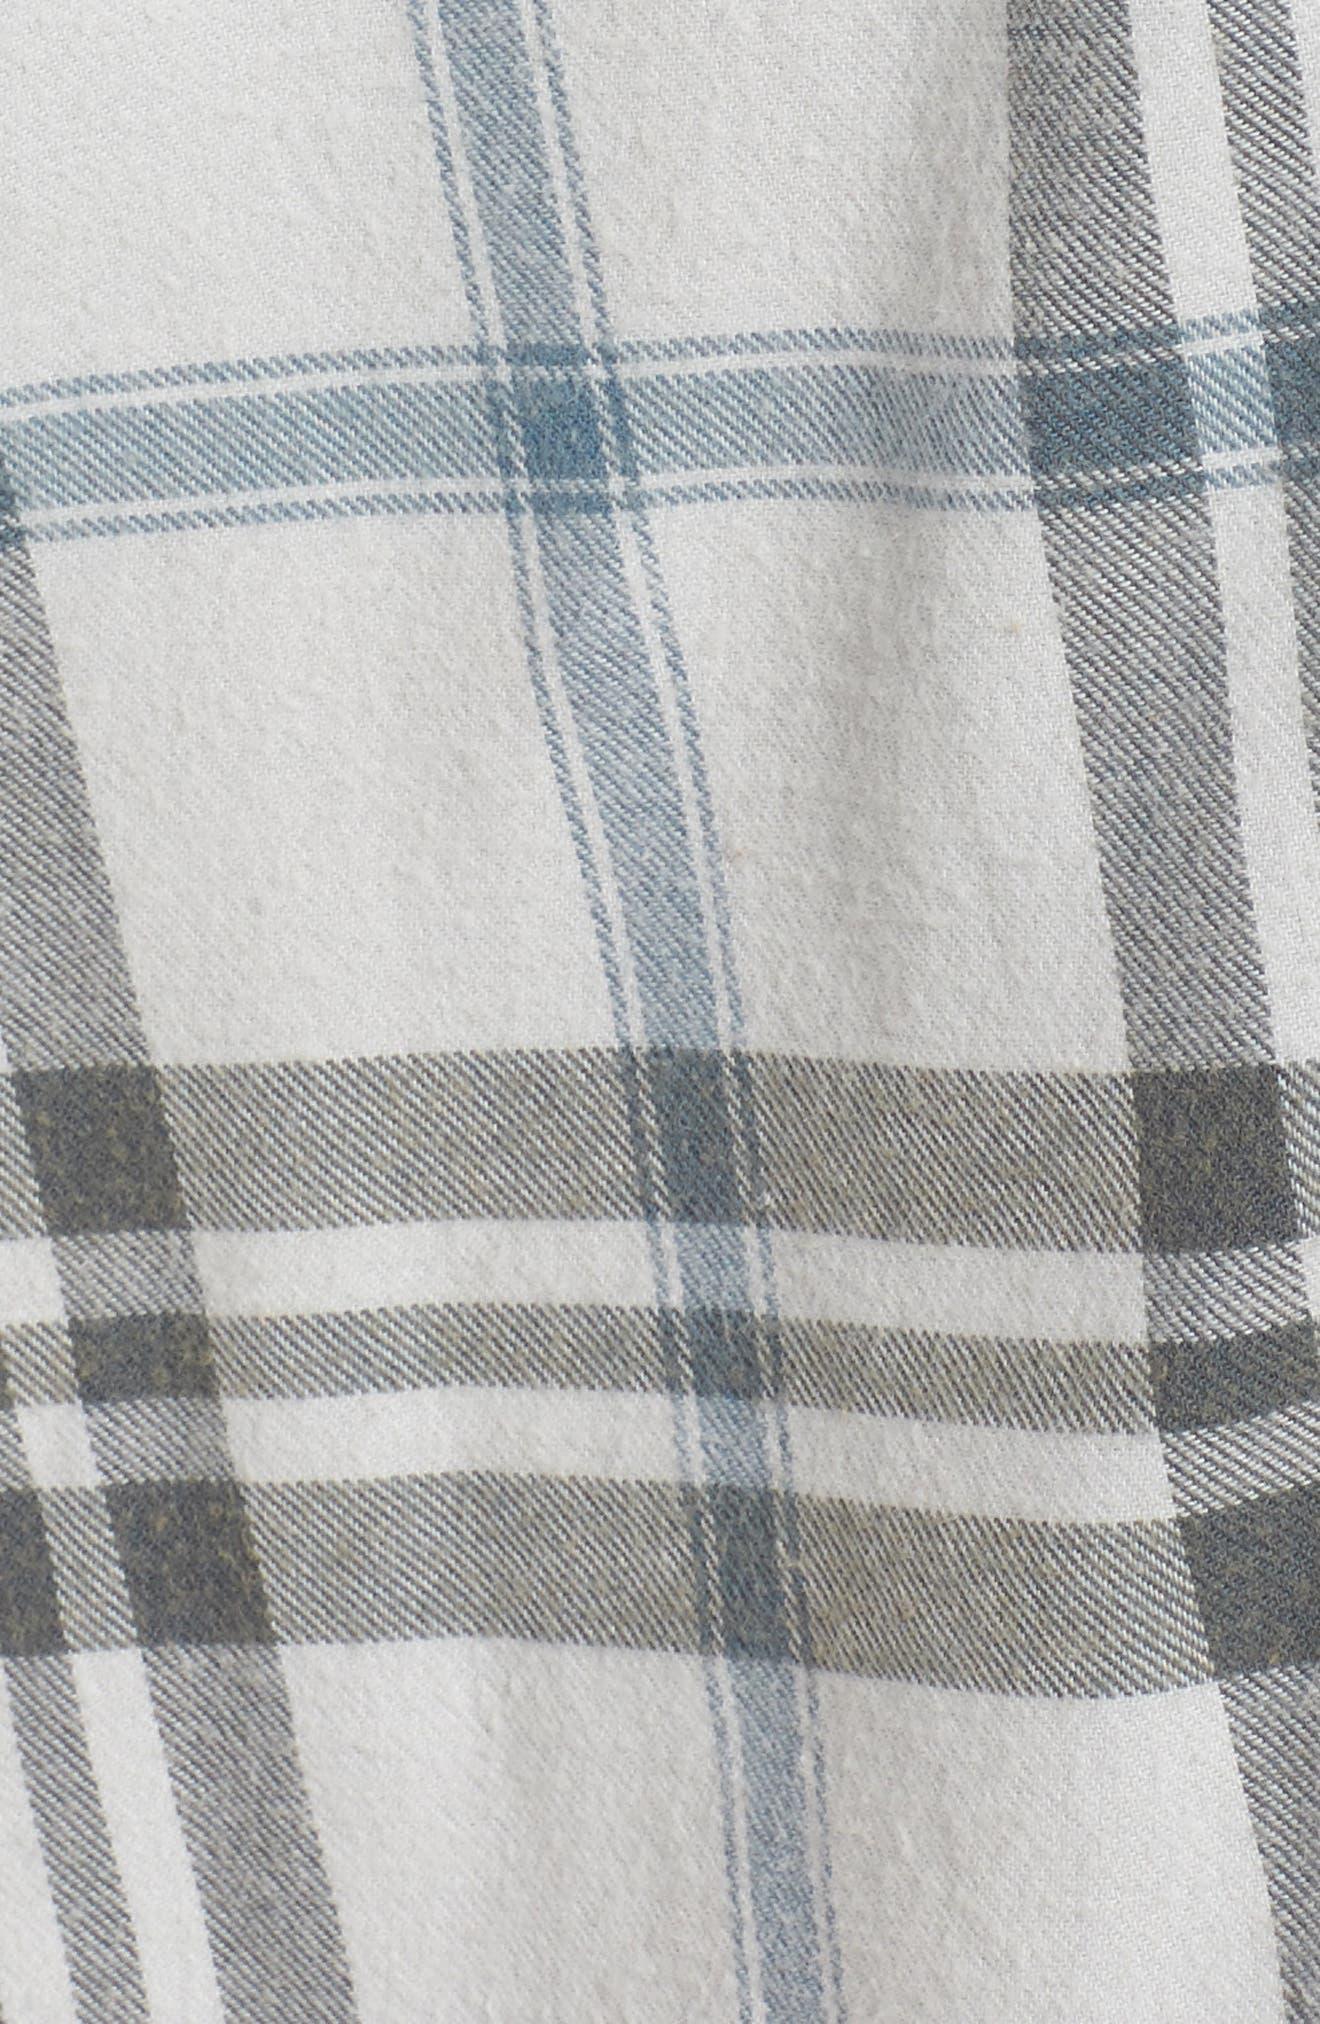 Plaid Cotton Blend Nightshirt,                             Alternate thumbnail 43, color,